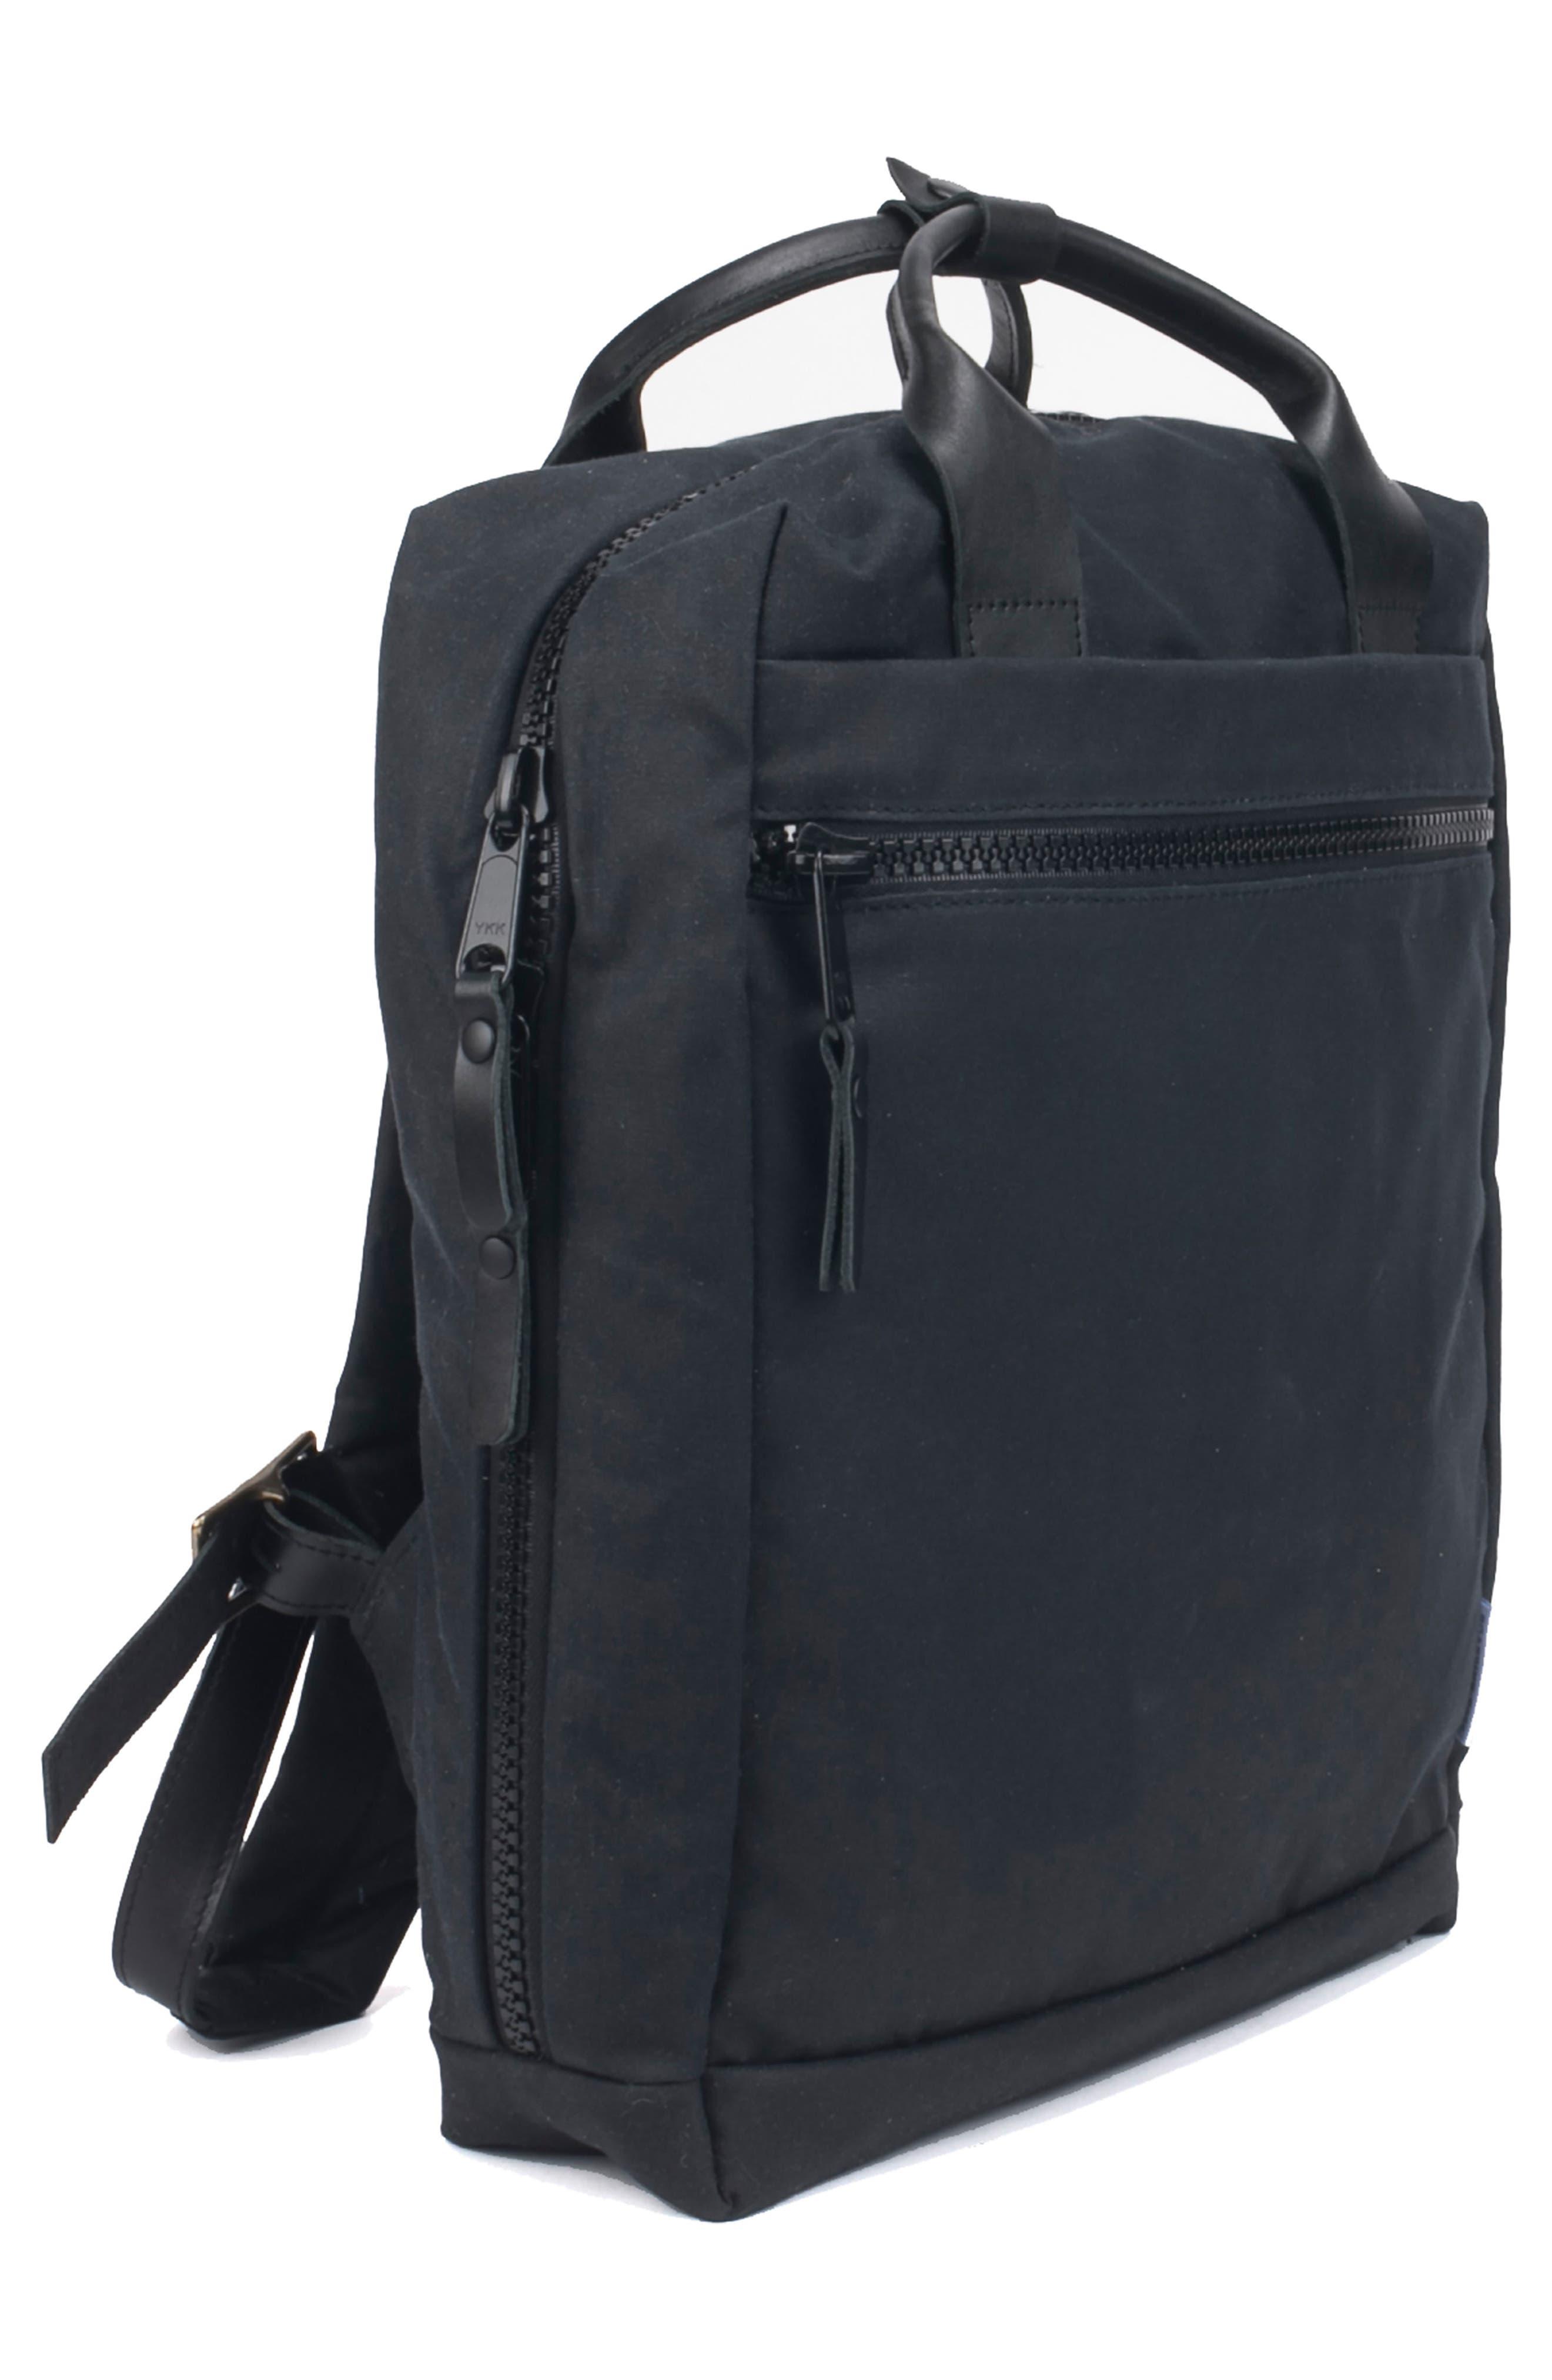 Metro Backpack,                             Alternate thumbnail 4, color,                             BLACK